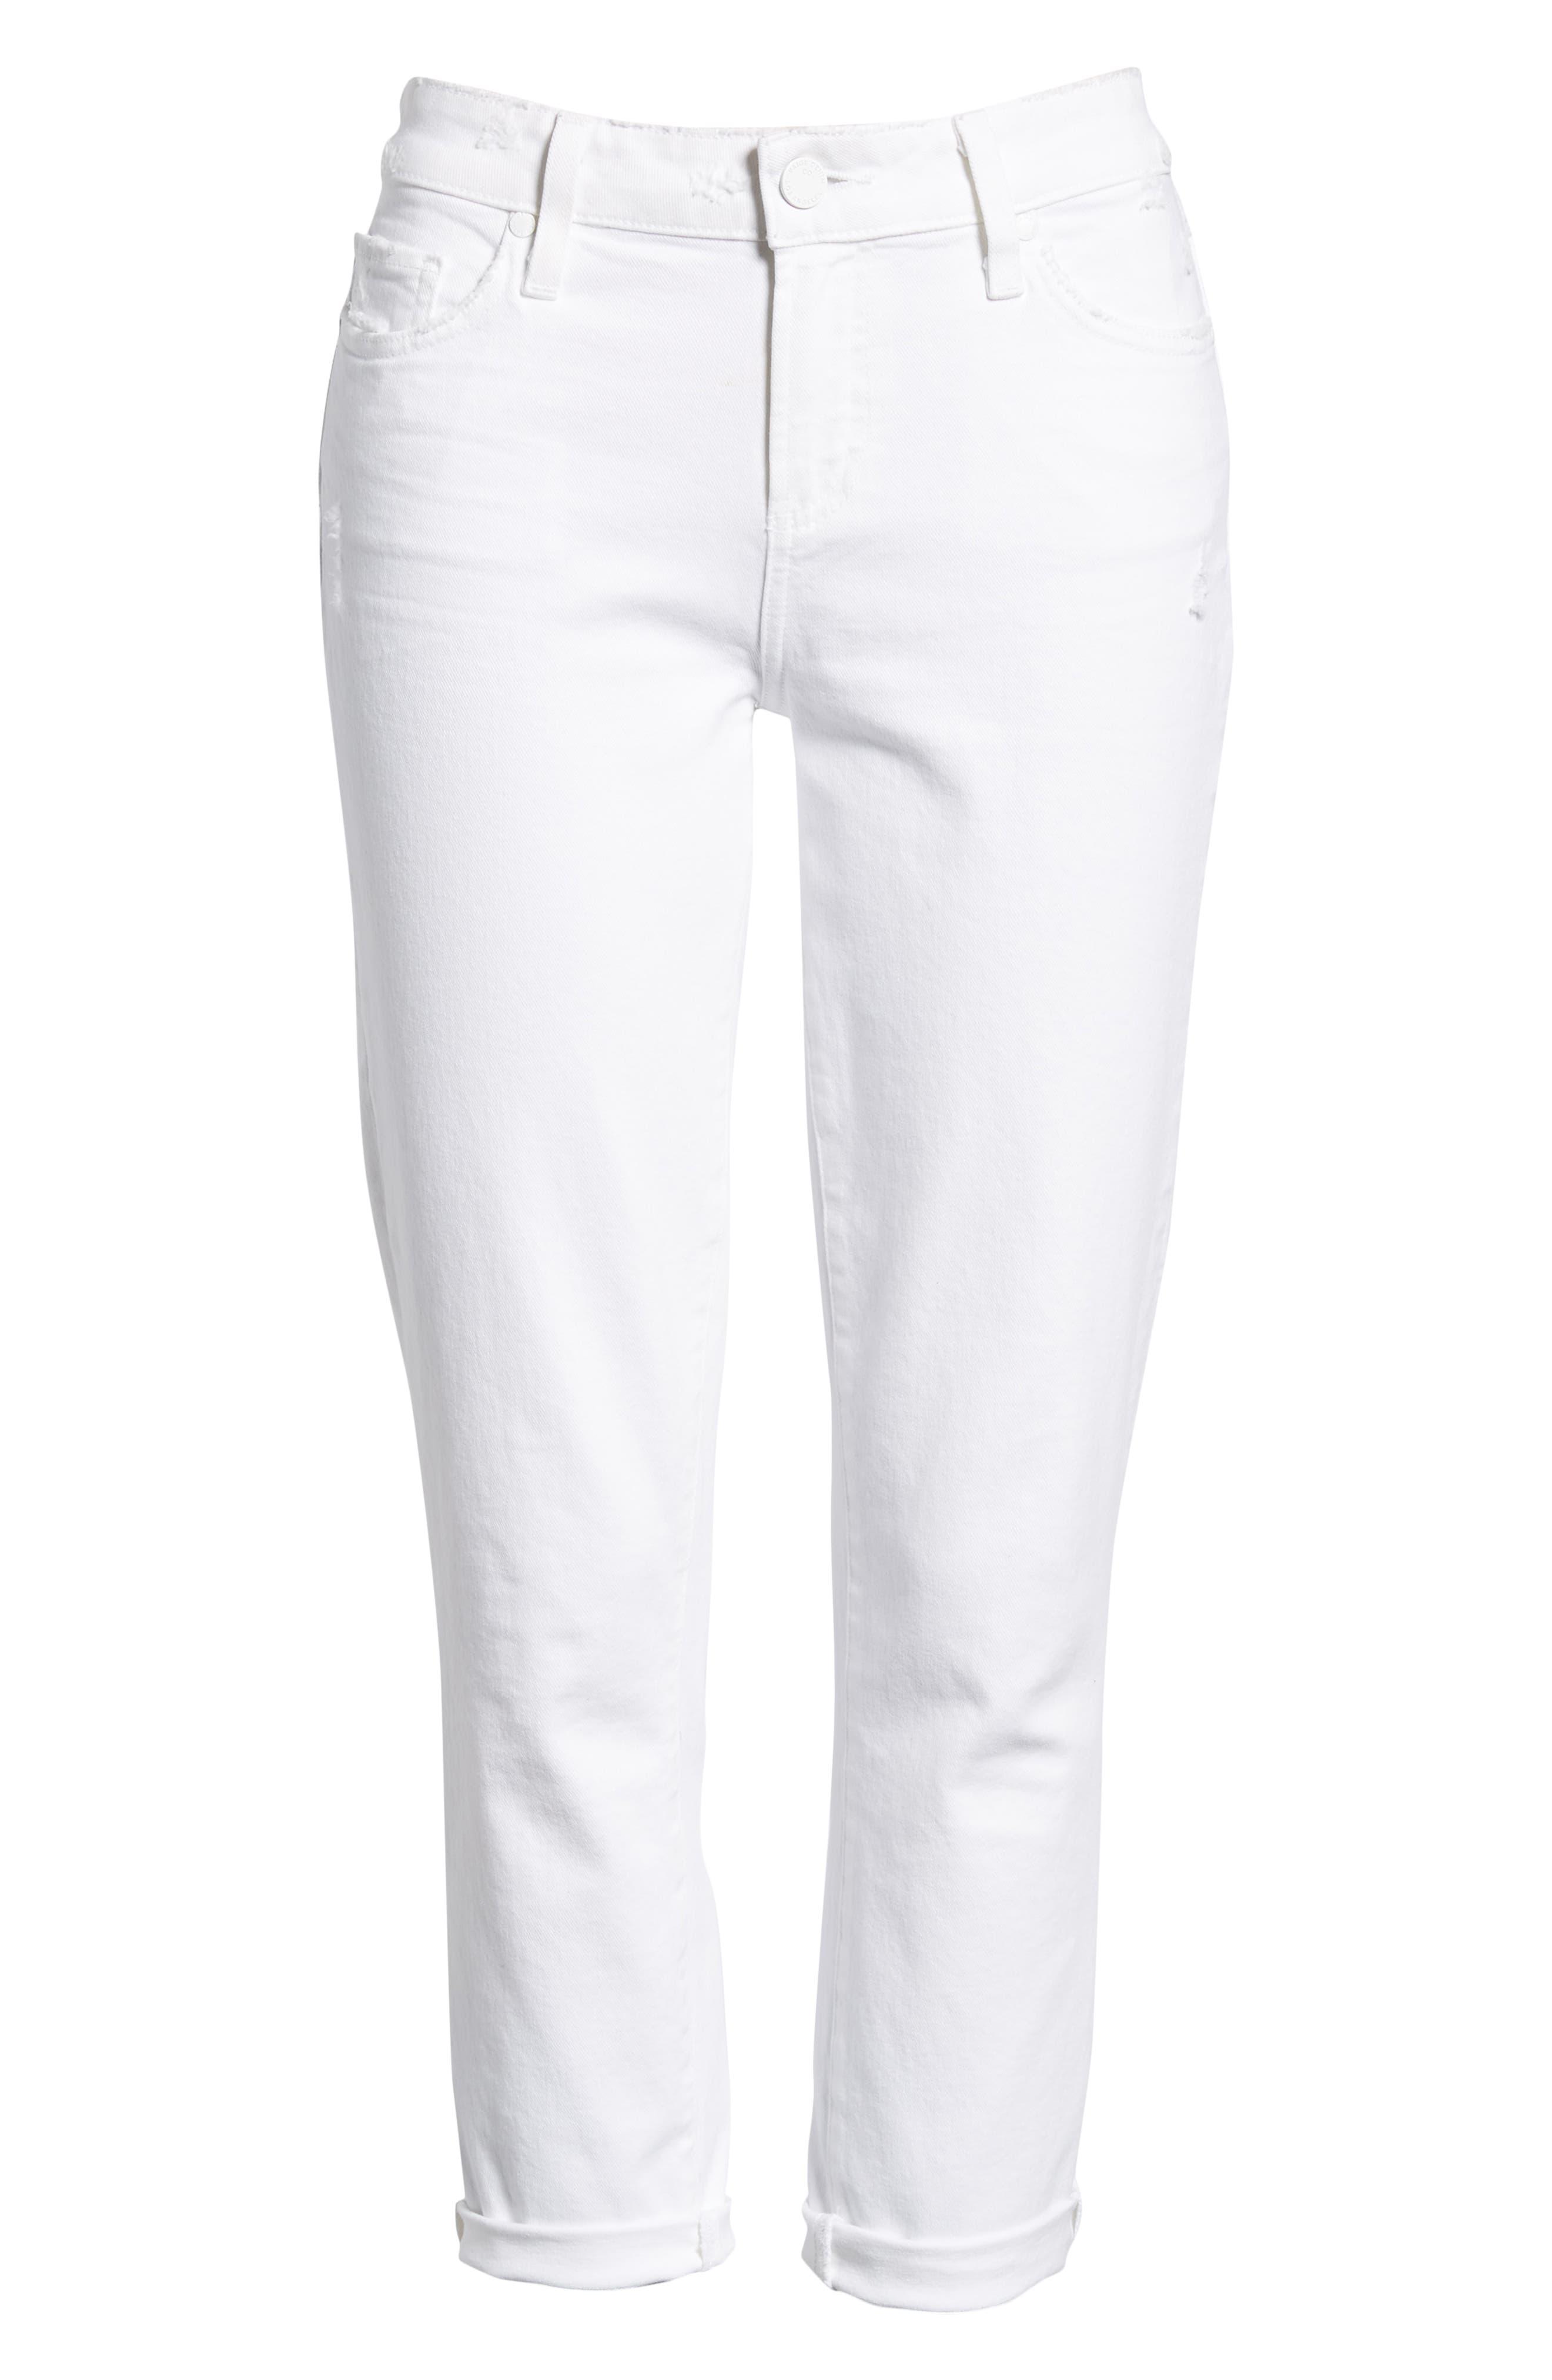 PAIGE, Skyline Raw Hem Crop Skinny Jeans, Alternate thumbnail 7, color, LIVED IN CRISP WHITE